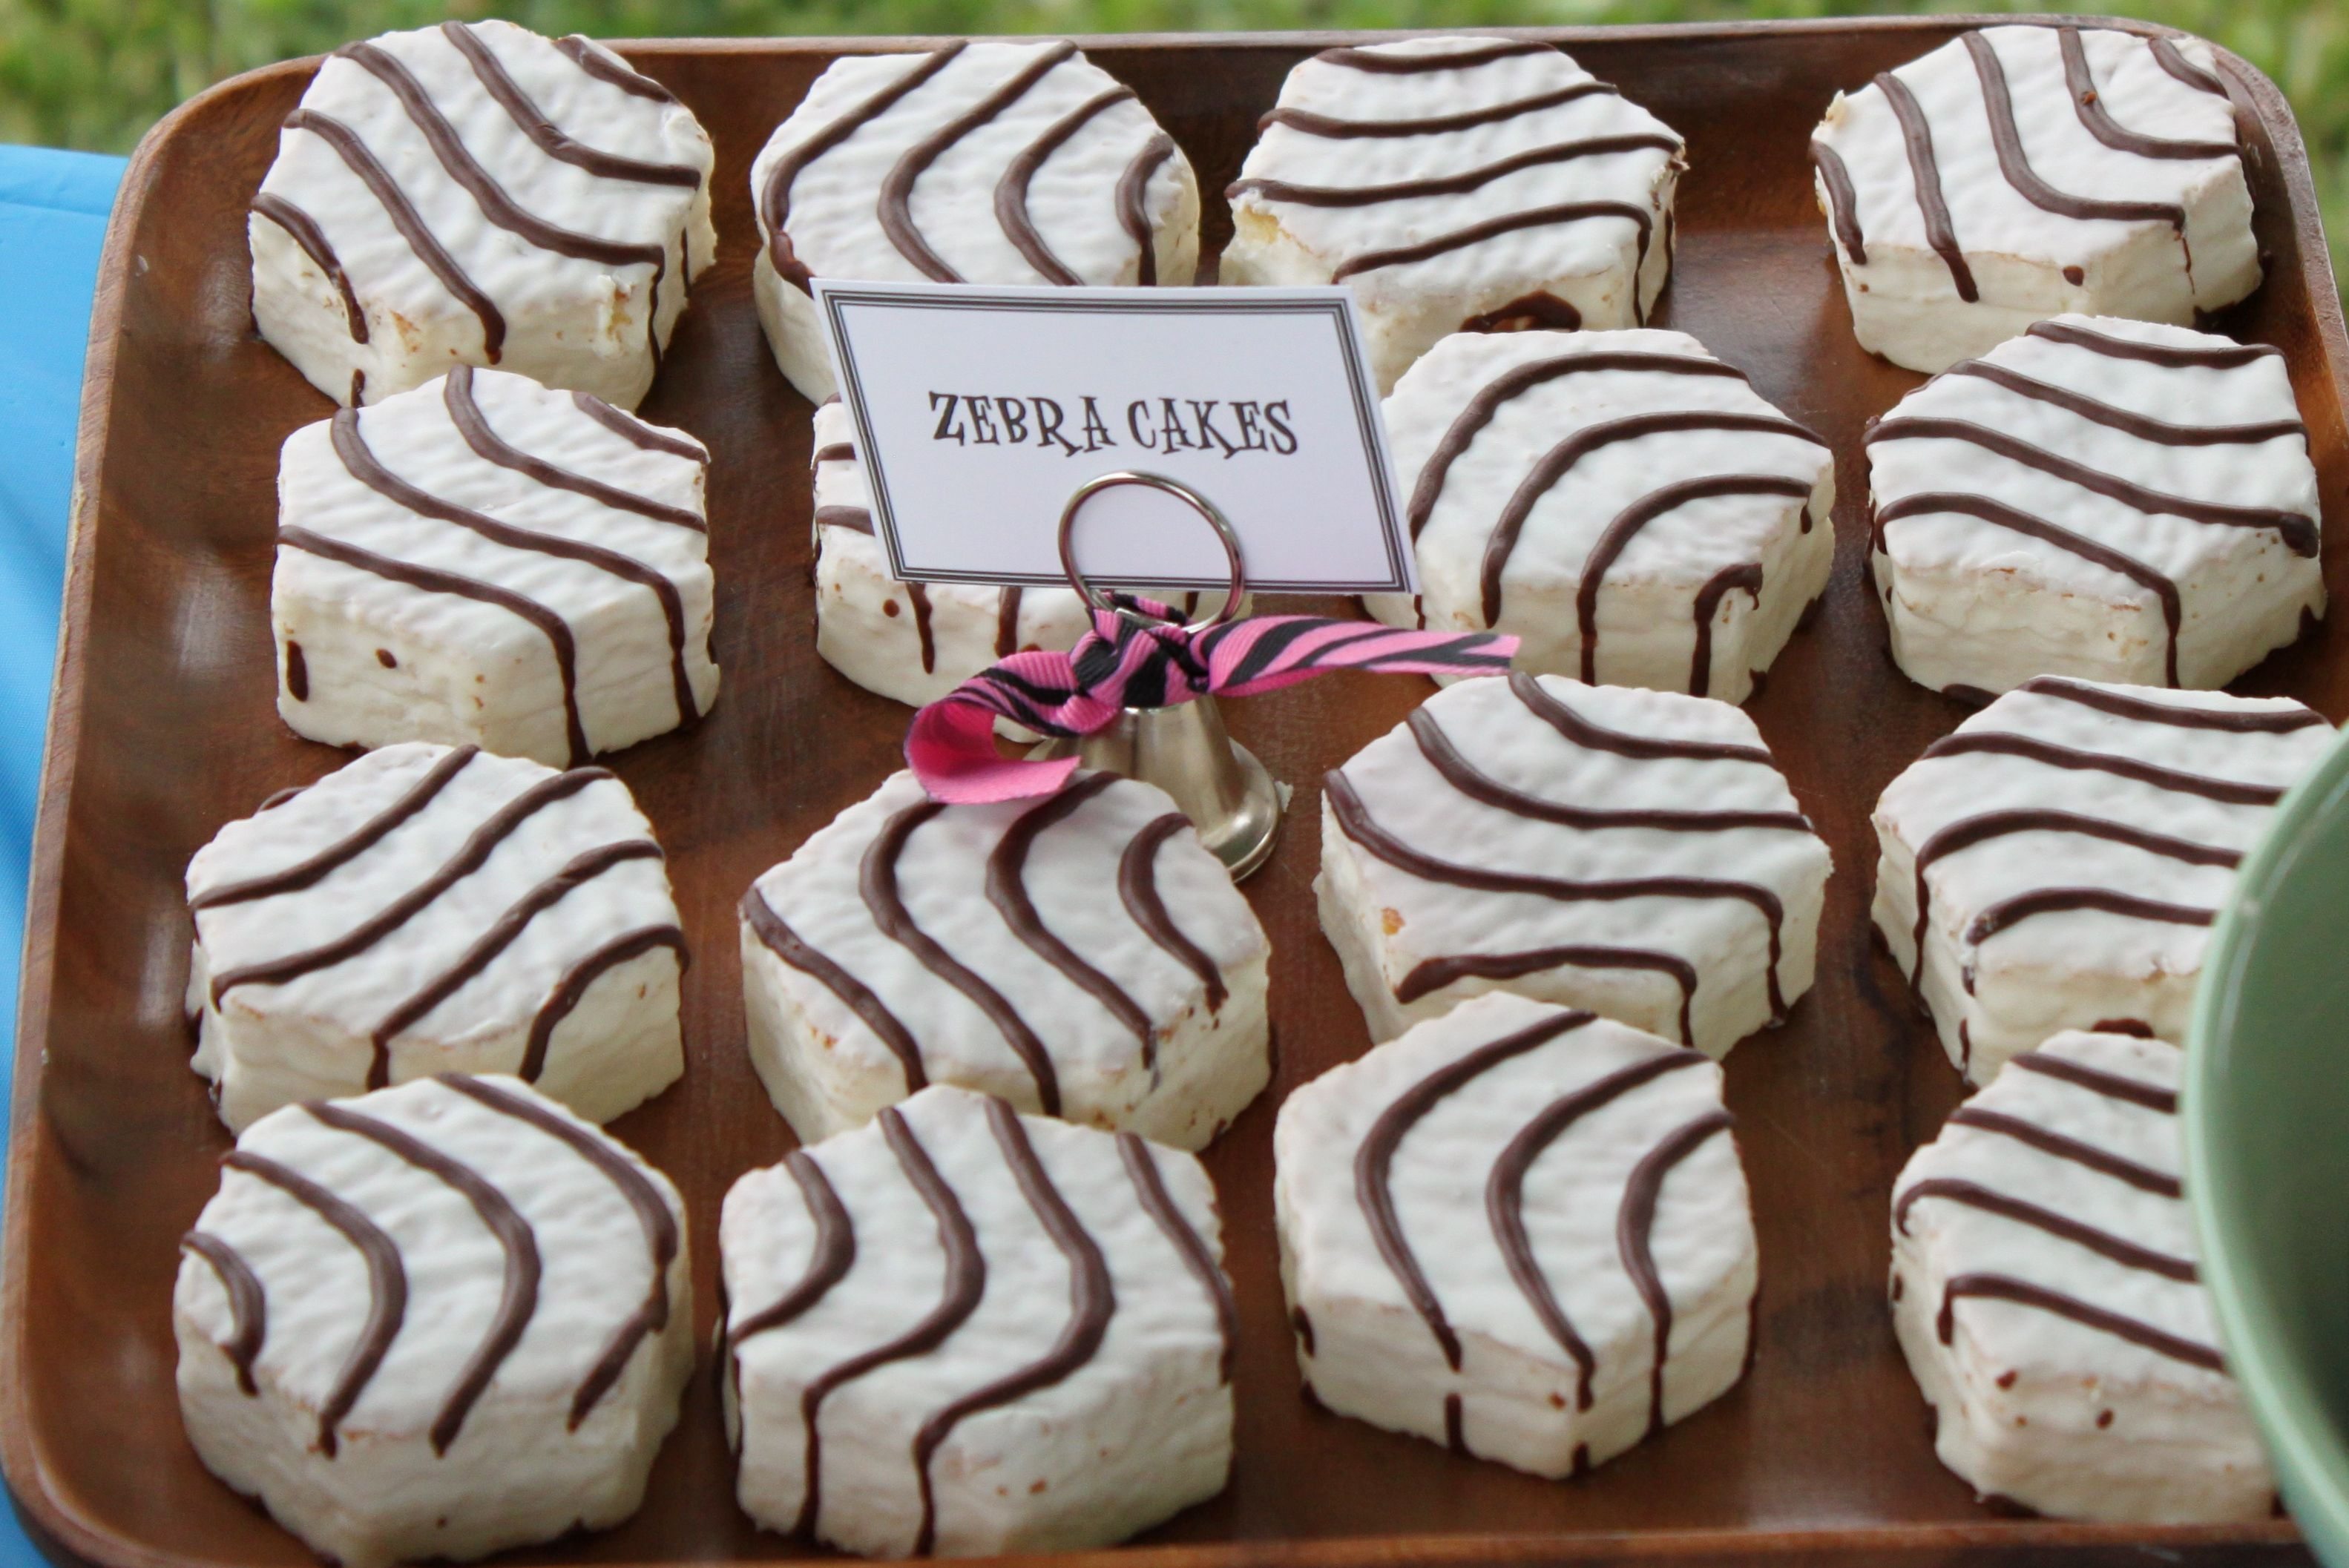 Vegan Little Debbie Zebra Cakes